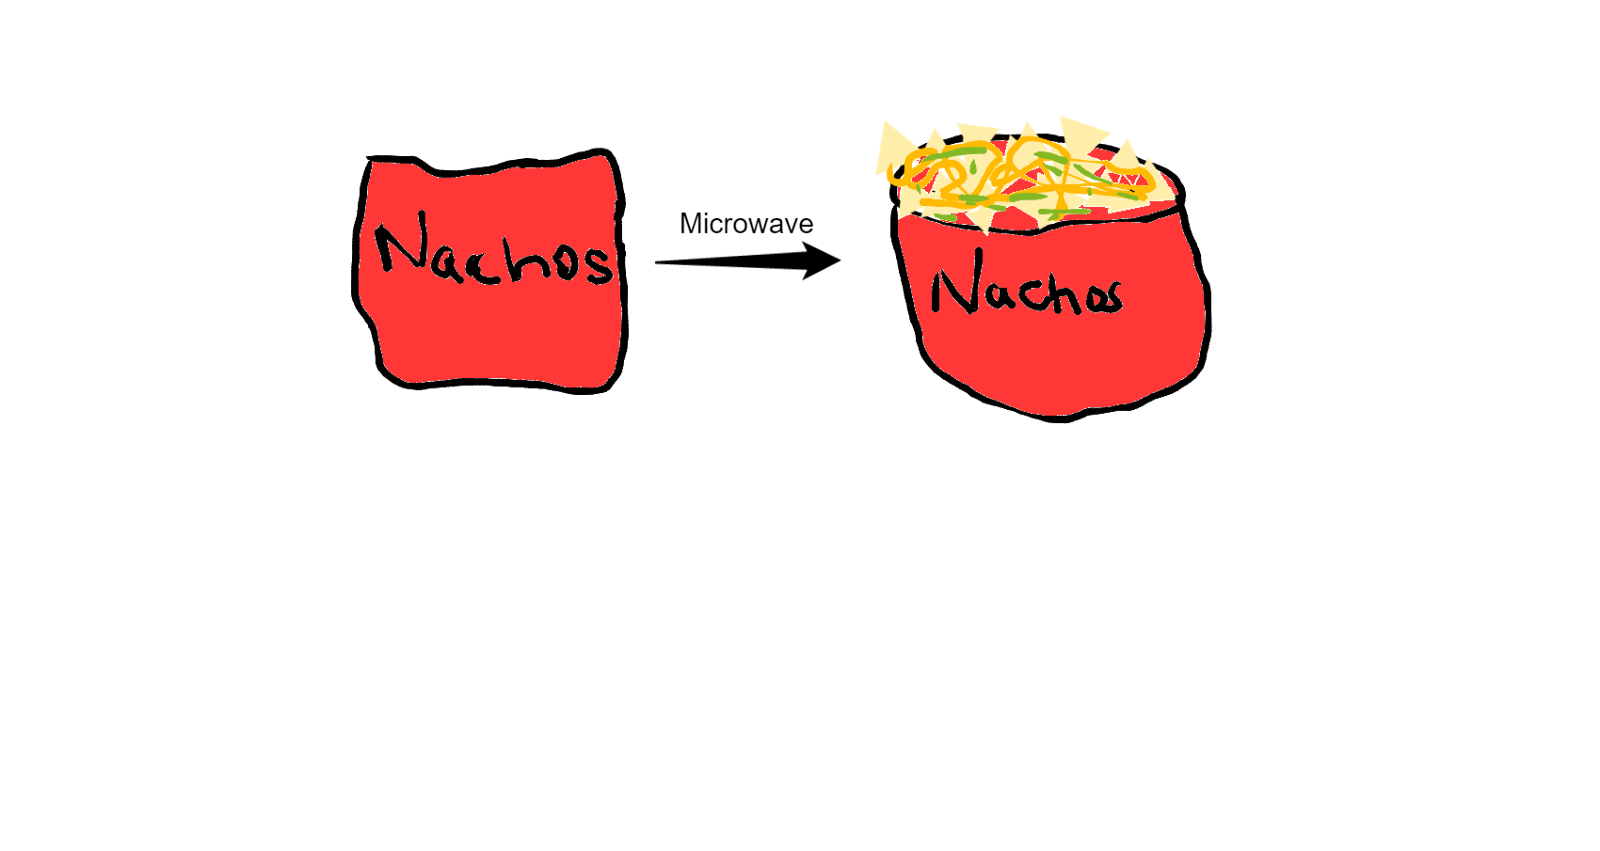 Nacho clipart melted cheese. Evaluation neel kumar medium